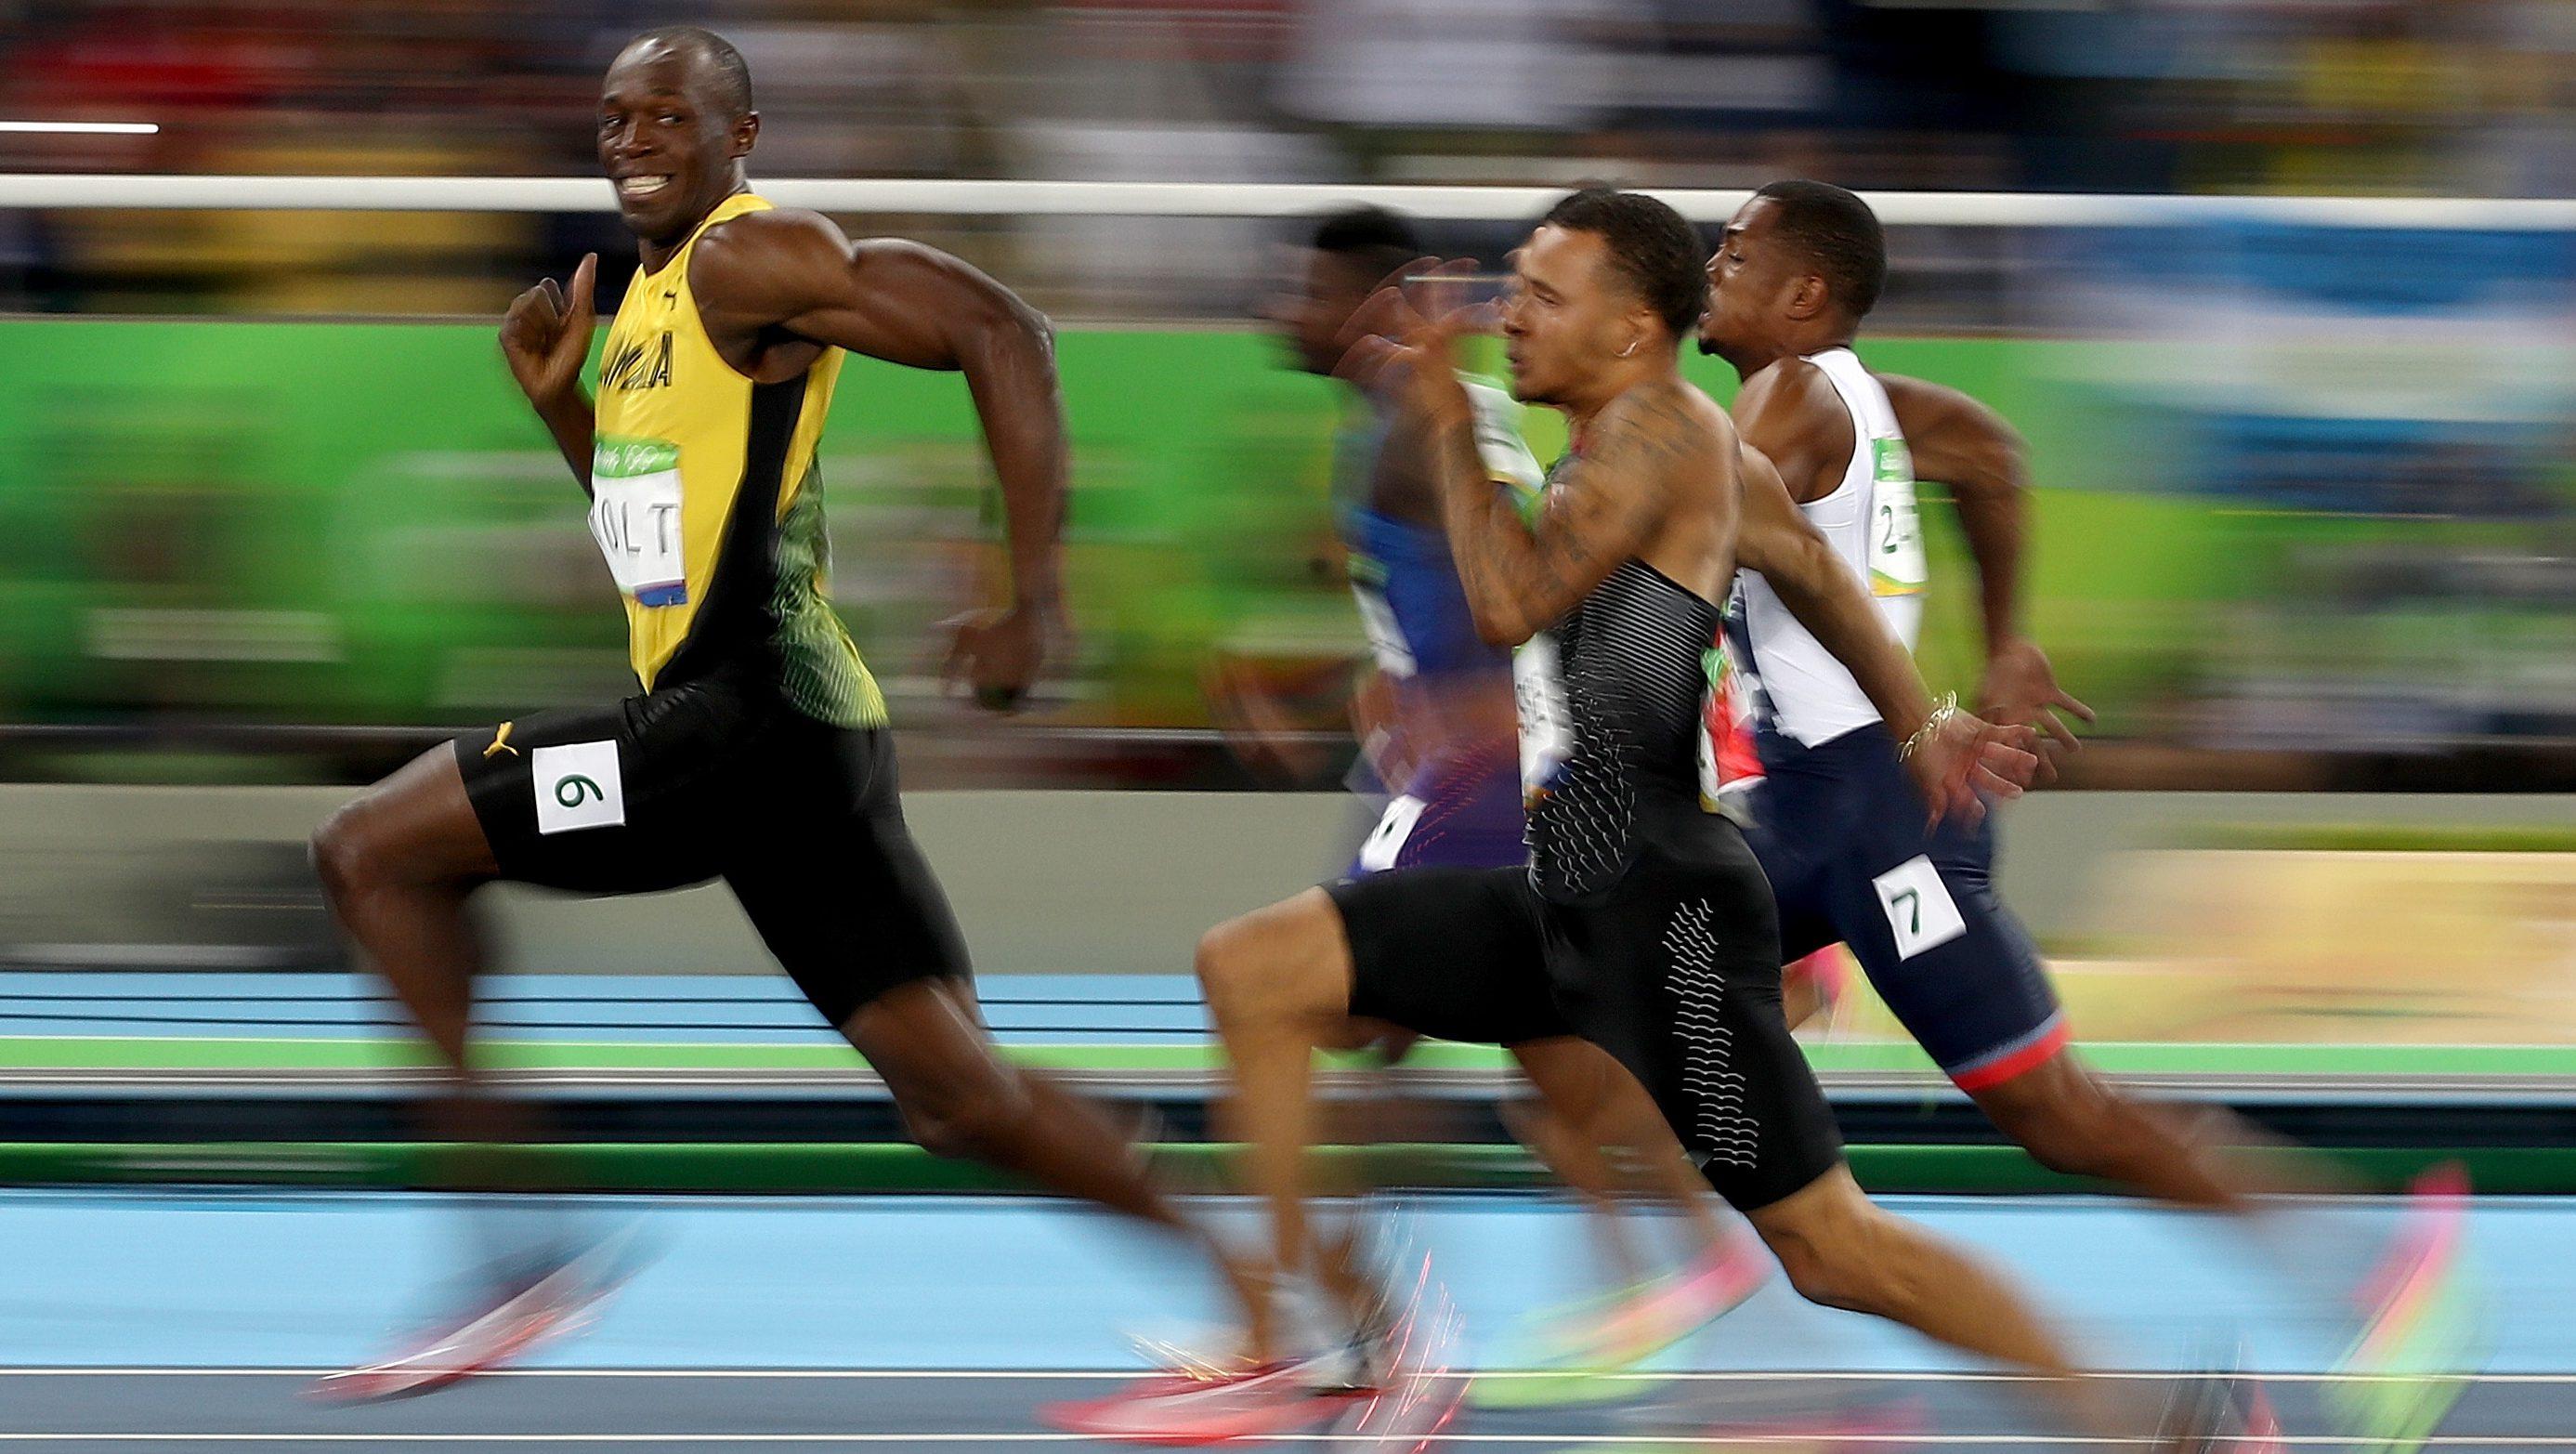 *** BESTPIX *** Athletics – Olympics: Day 9